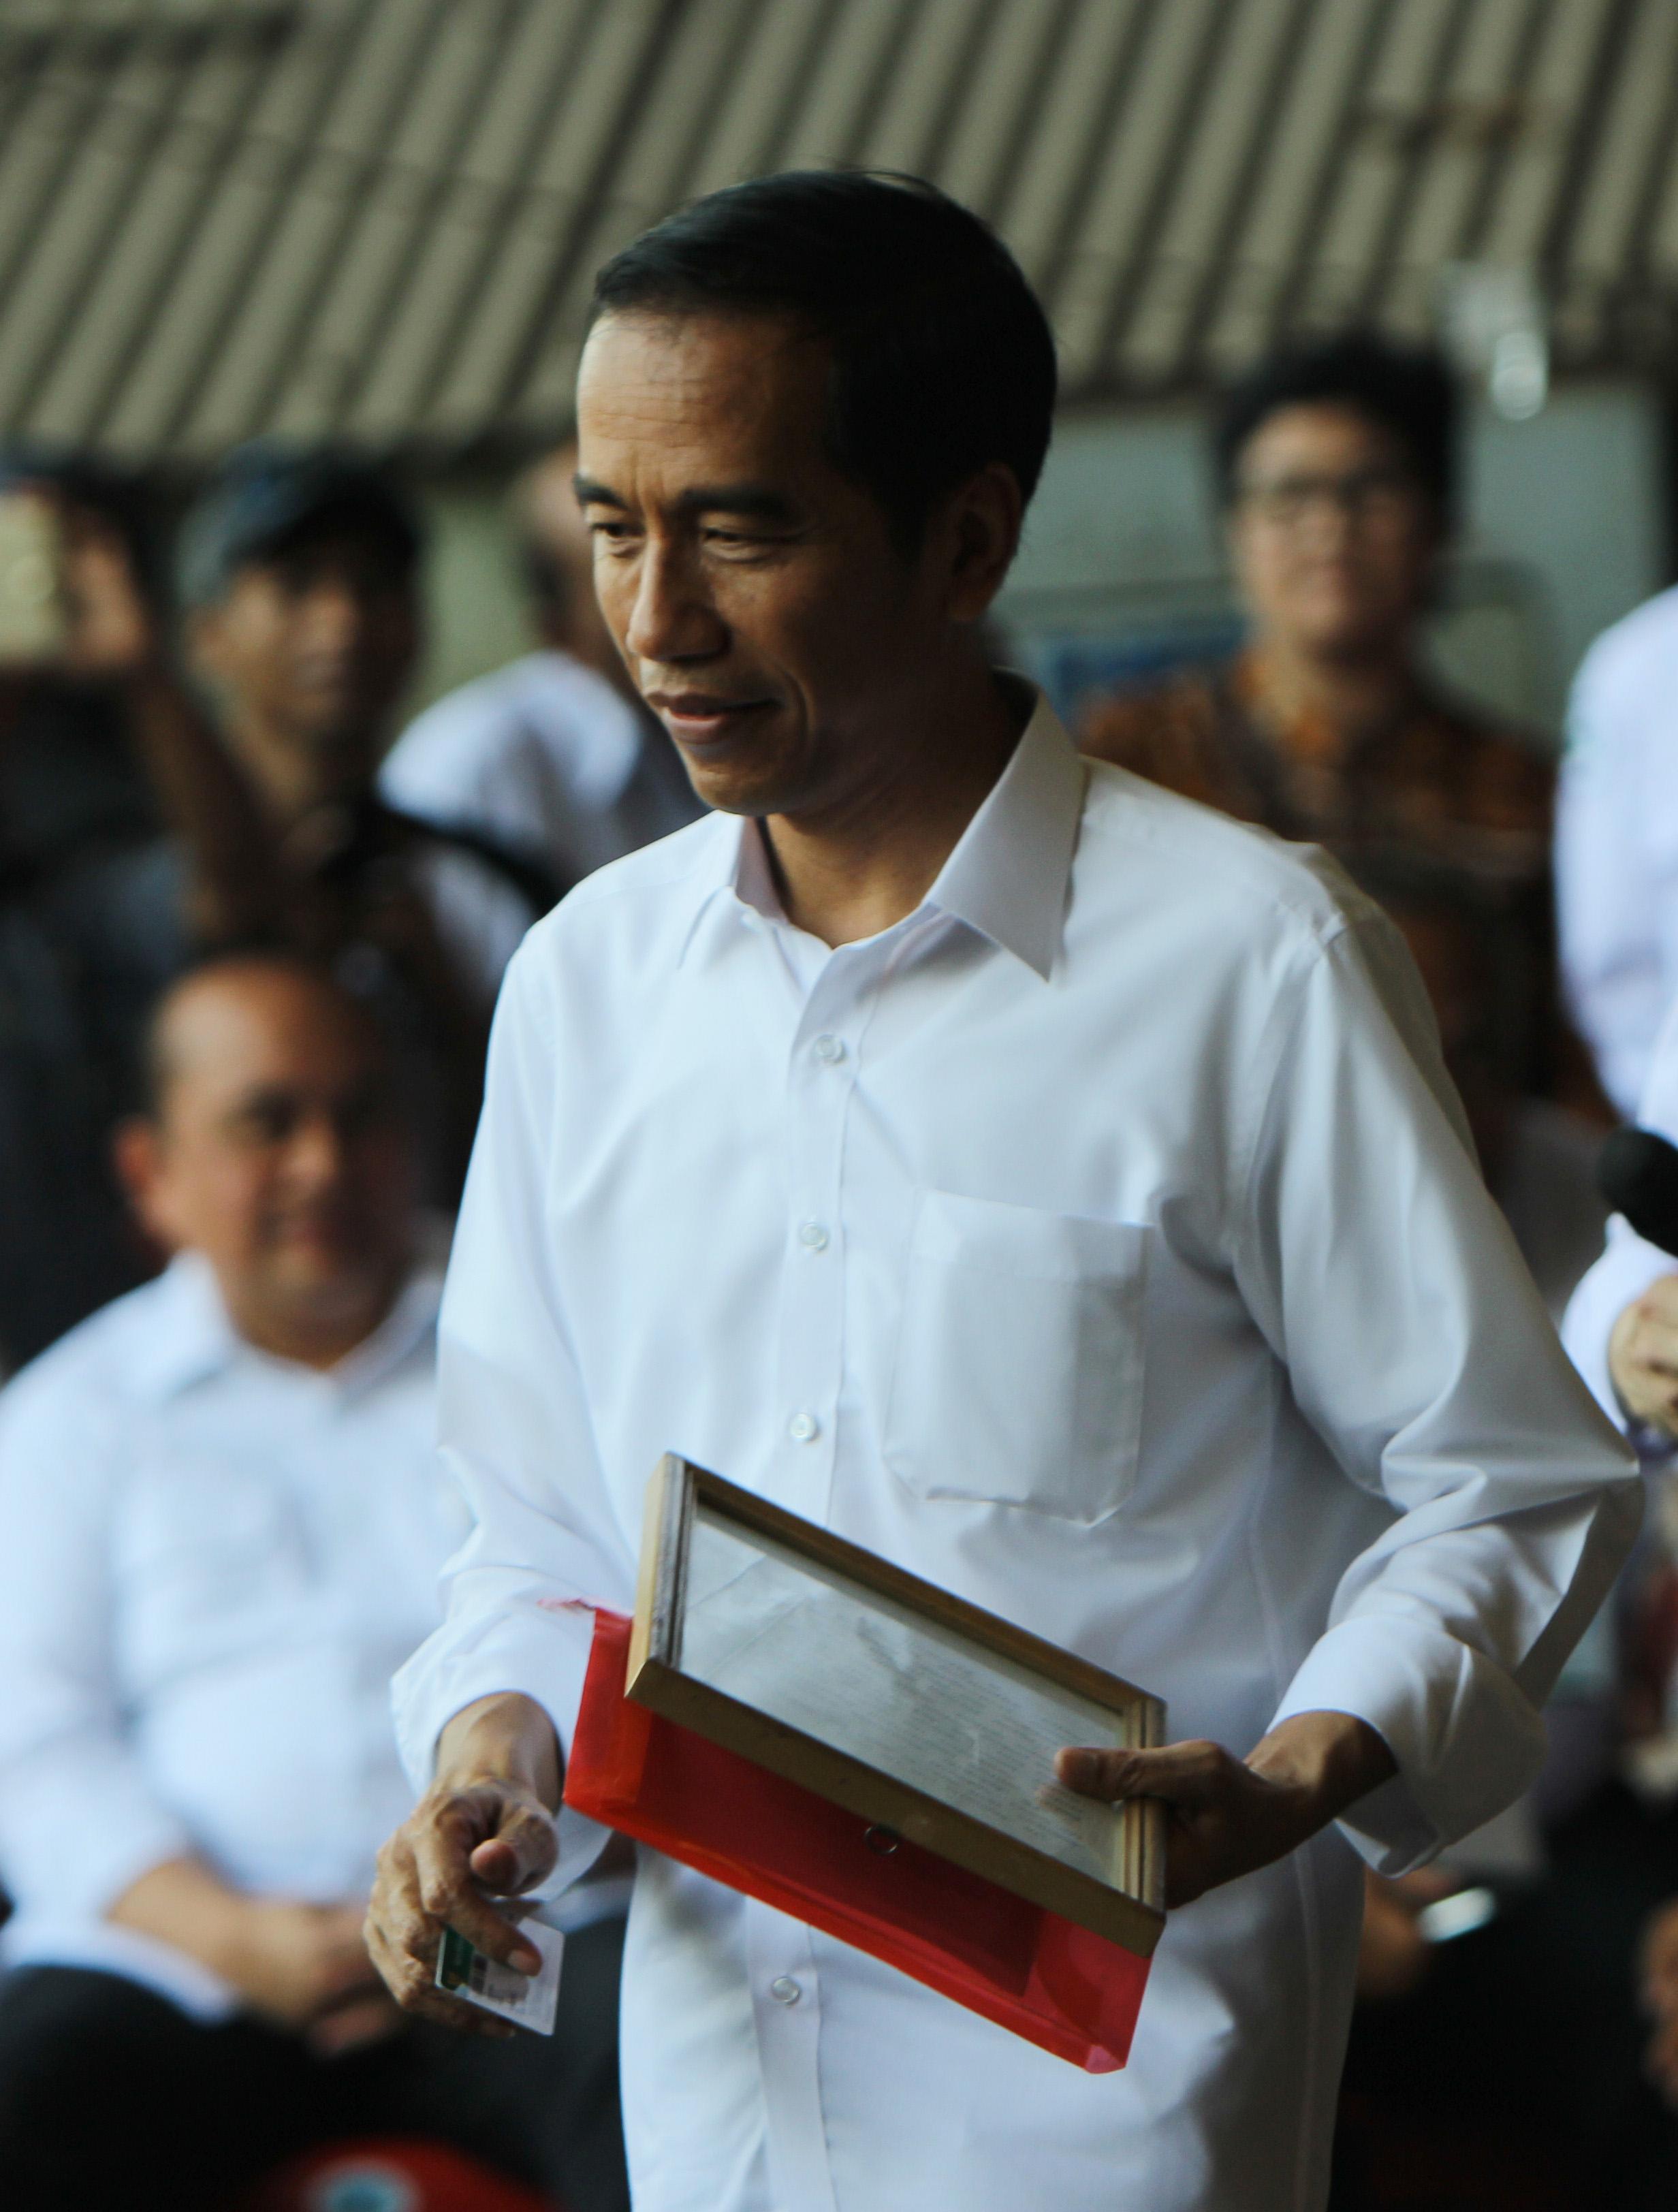 Presiden Jokowi Mendapatkan Bingkisan dari Pekerja PT Dok dan Perkapalan Kodja Bahari